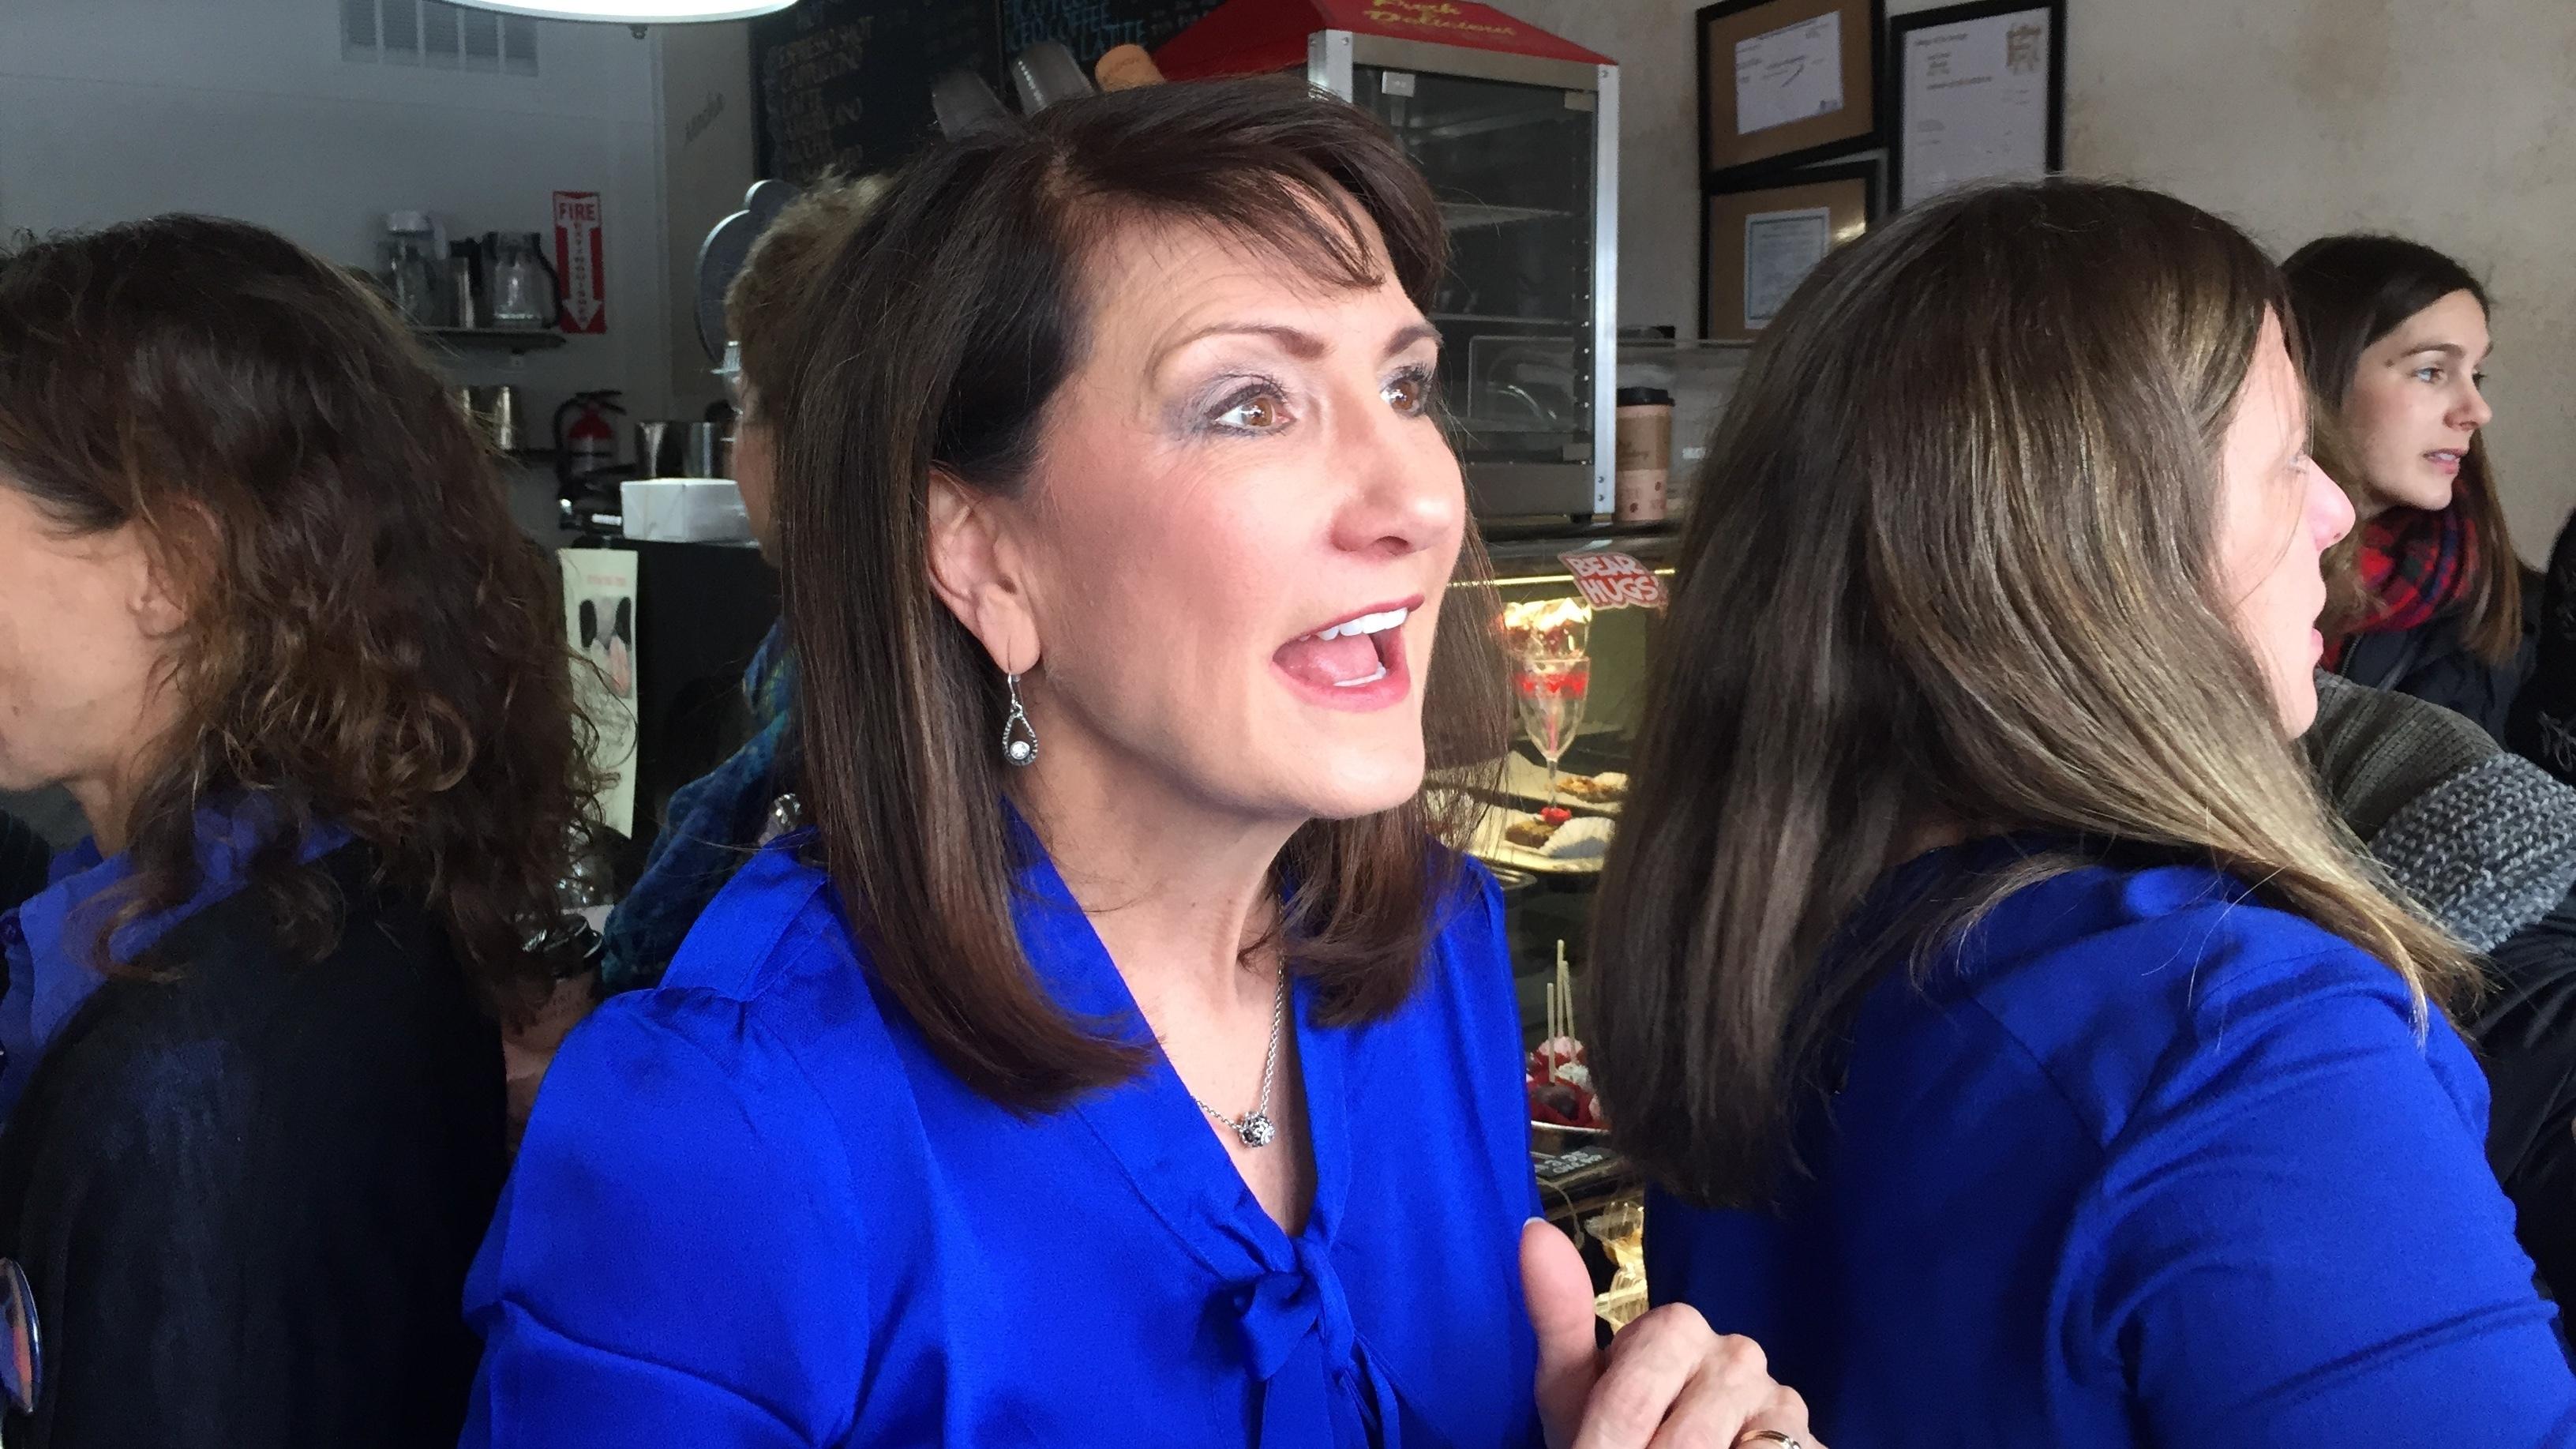 Democrat Marie Newman speaks with supporters at a campaign event in La Grange, Ill. (Sara Burnett/AP)